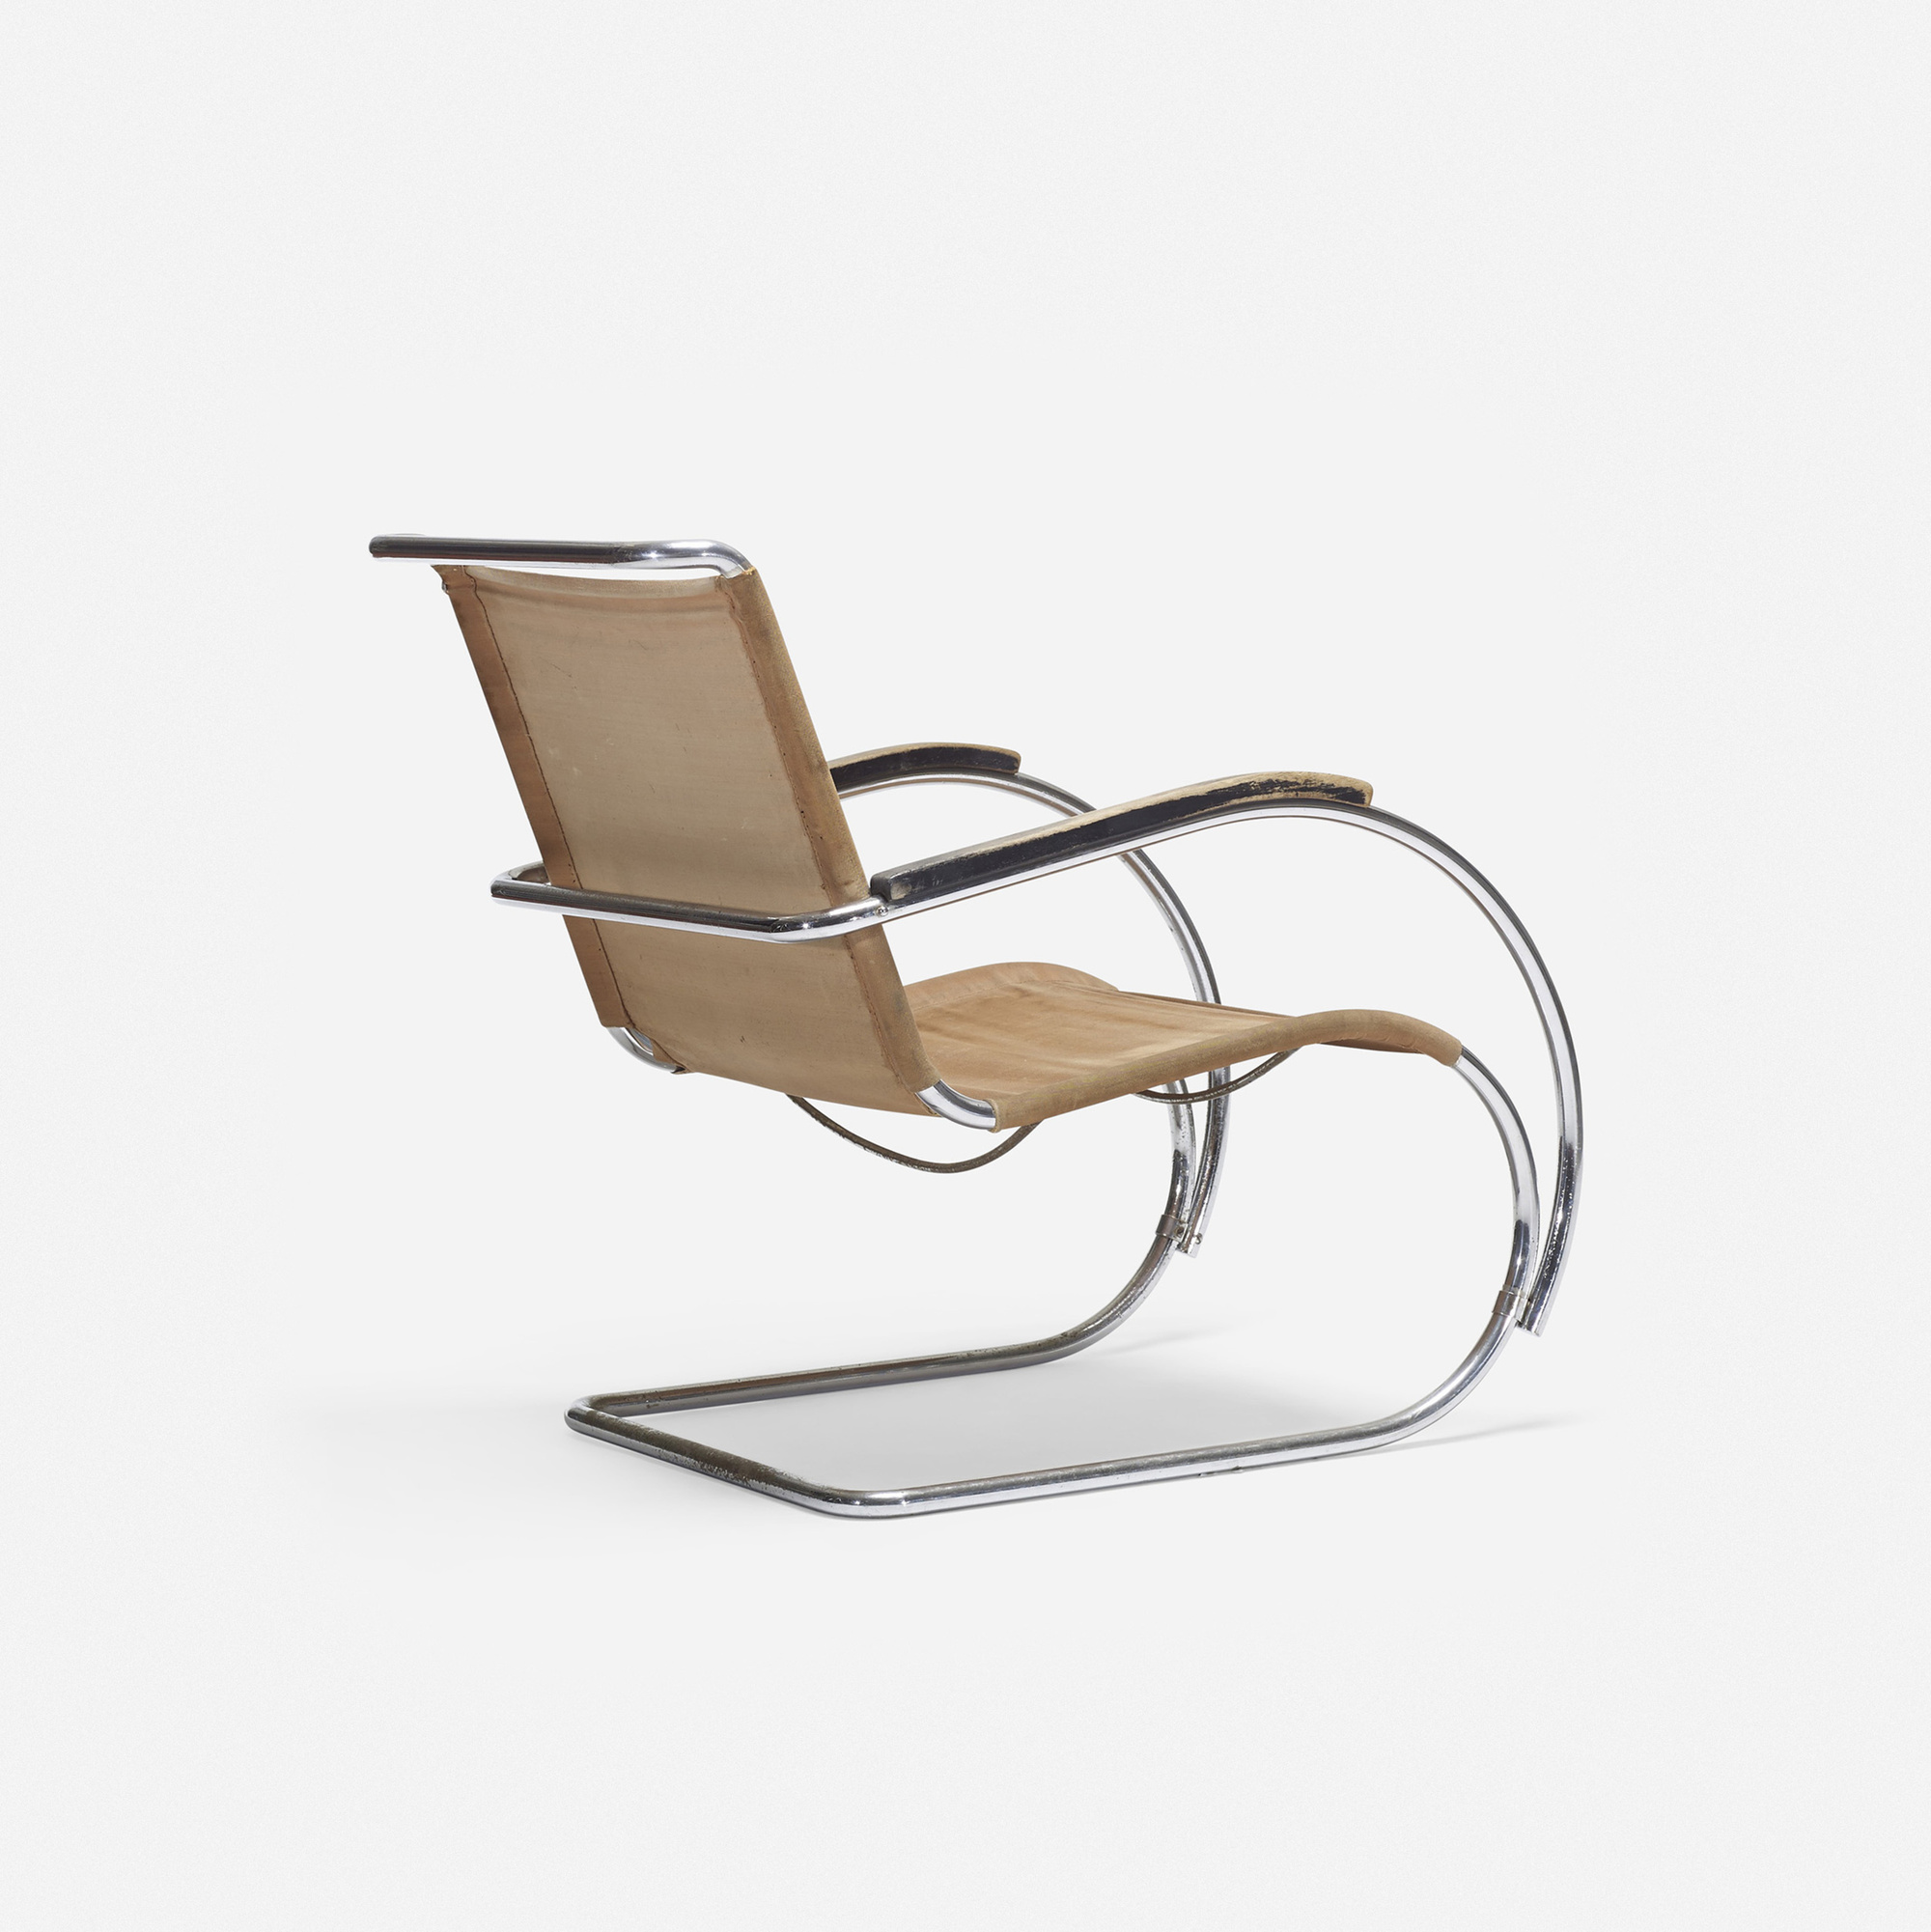 431 Ludwig Mies van der Rohe MR40 lounge chair Mass Modern